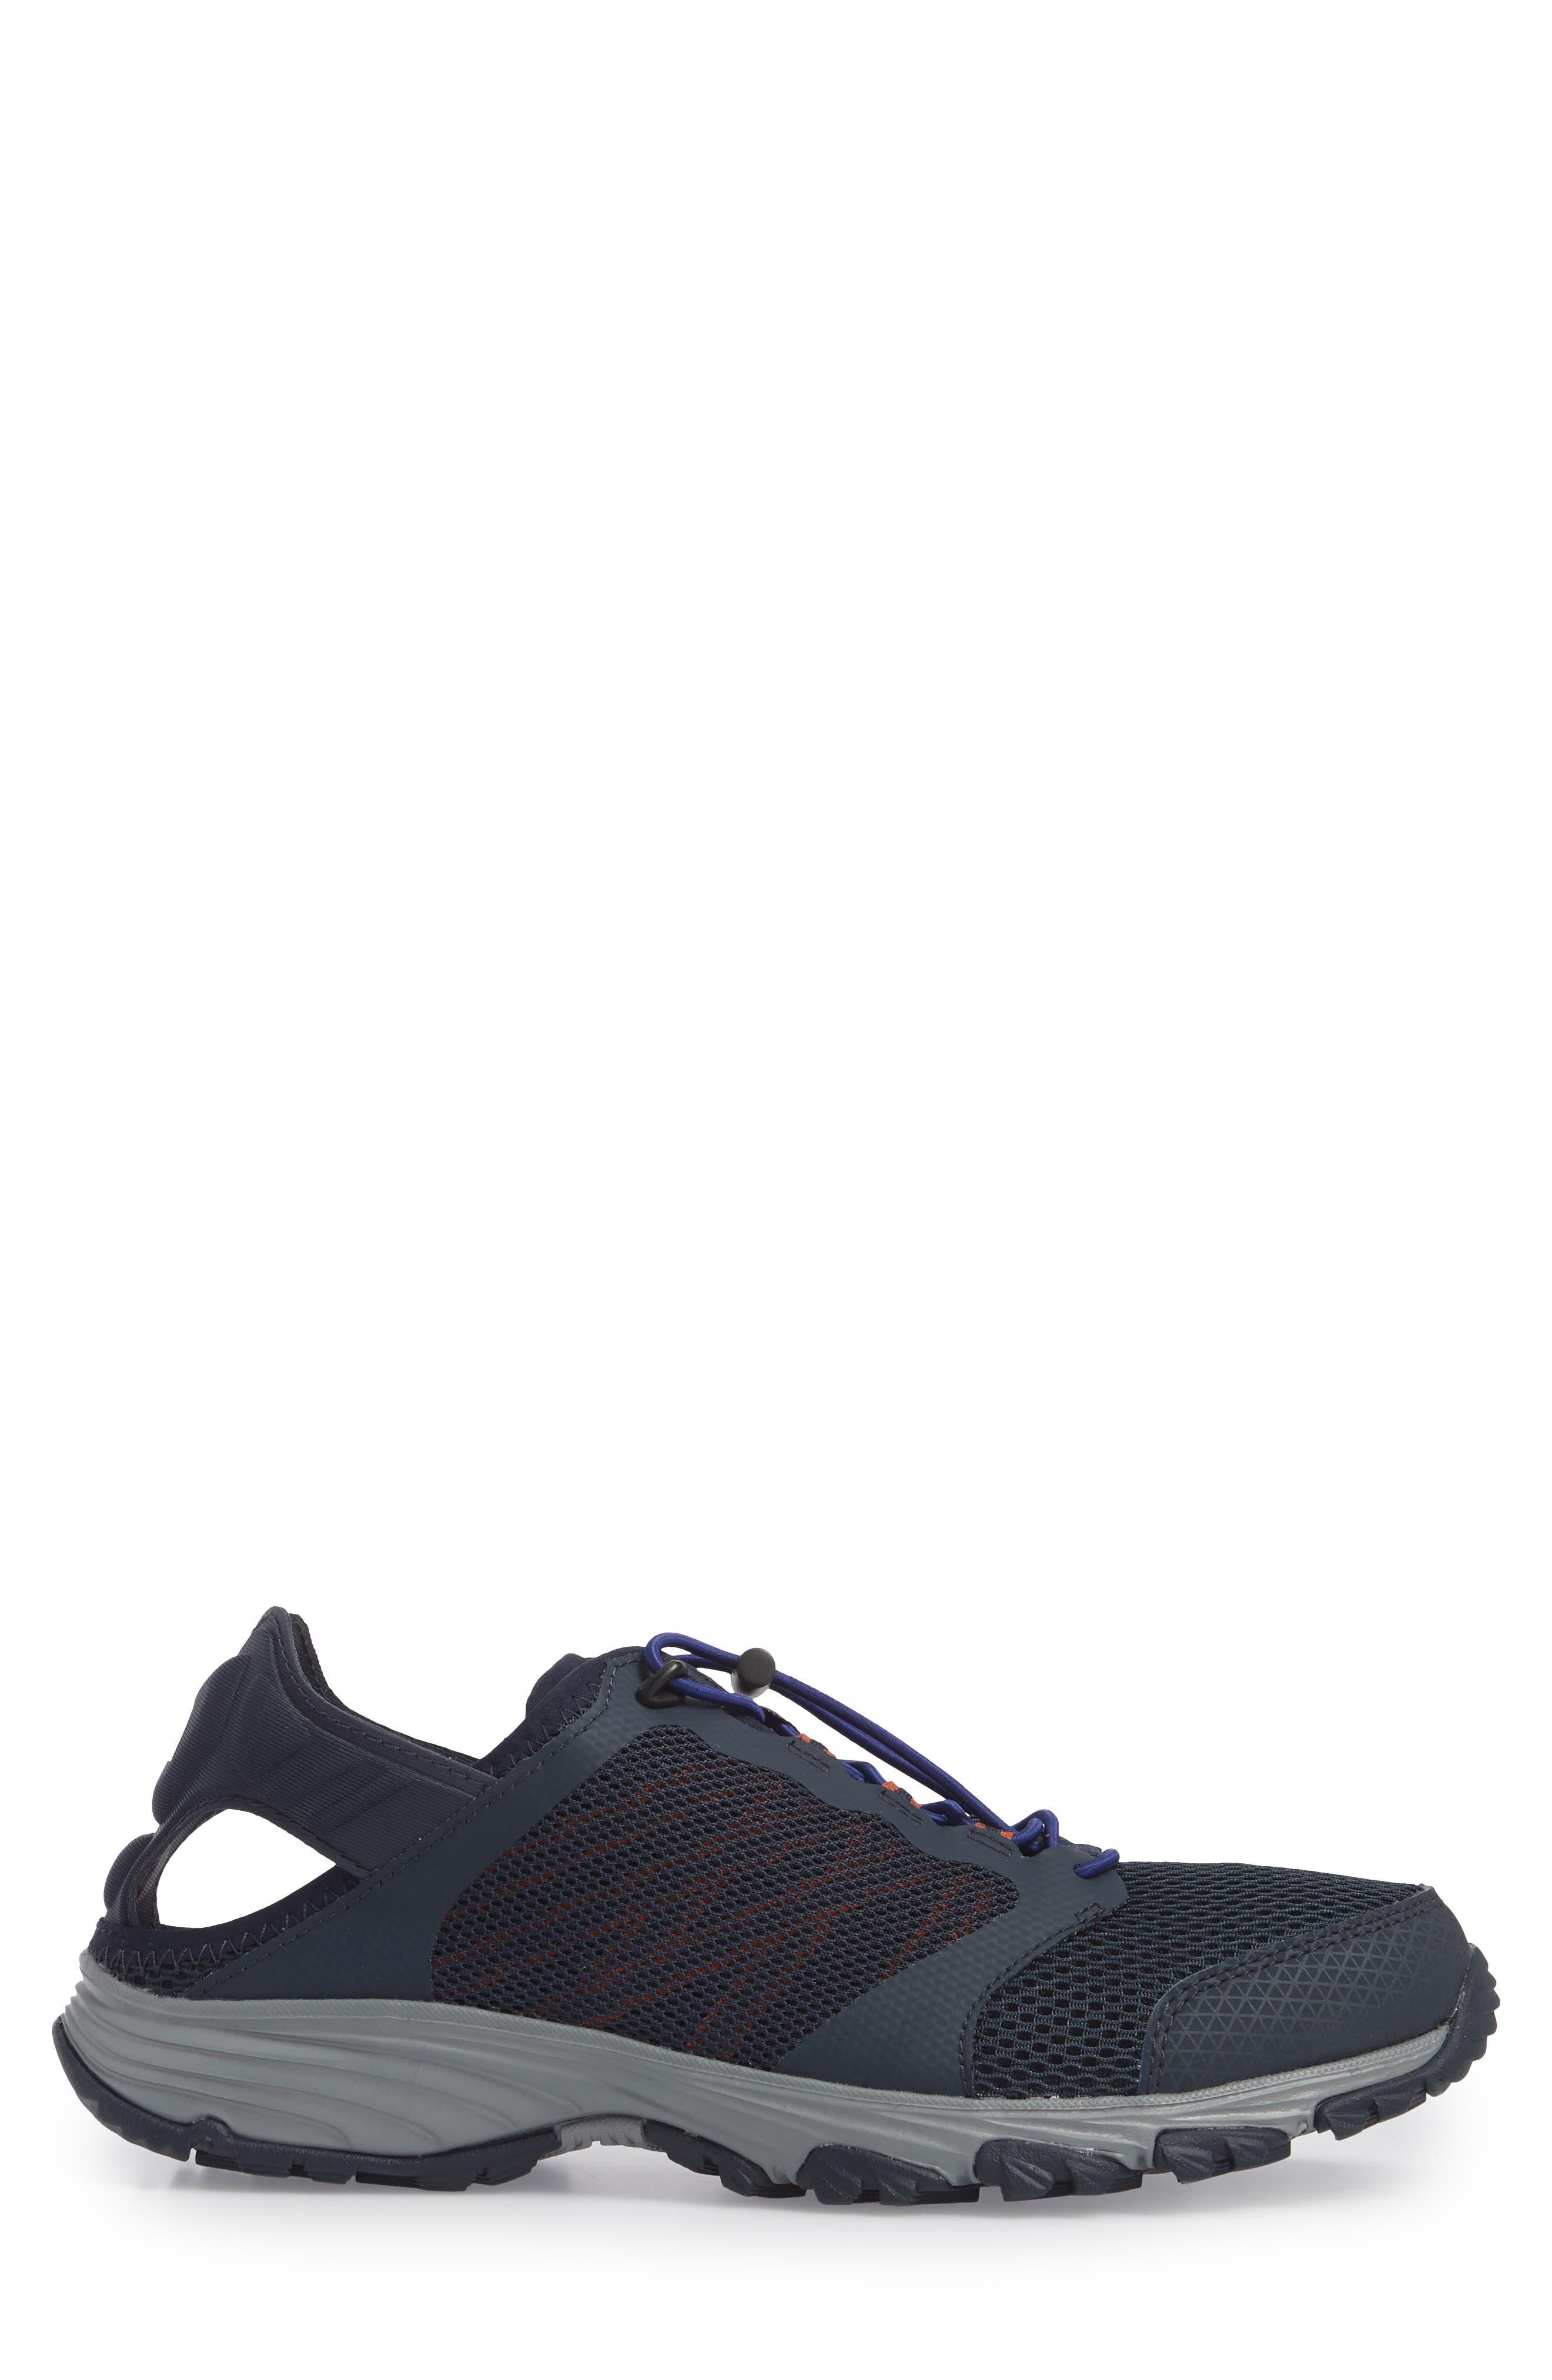 Litewave Amphibious II Collapsible Sneaker,                             Alternate thumbnail 3, color,                             Urban Navy/ Brit Blue